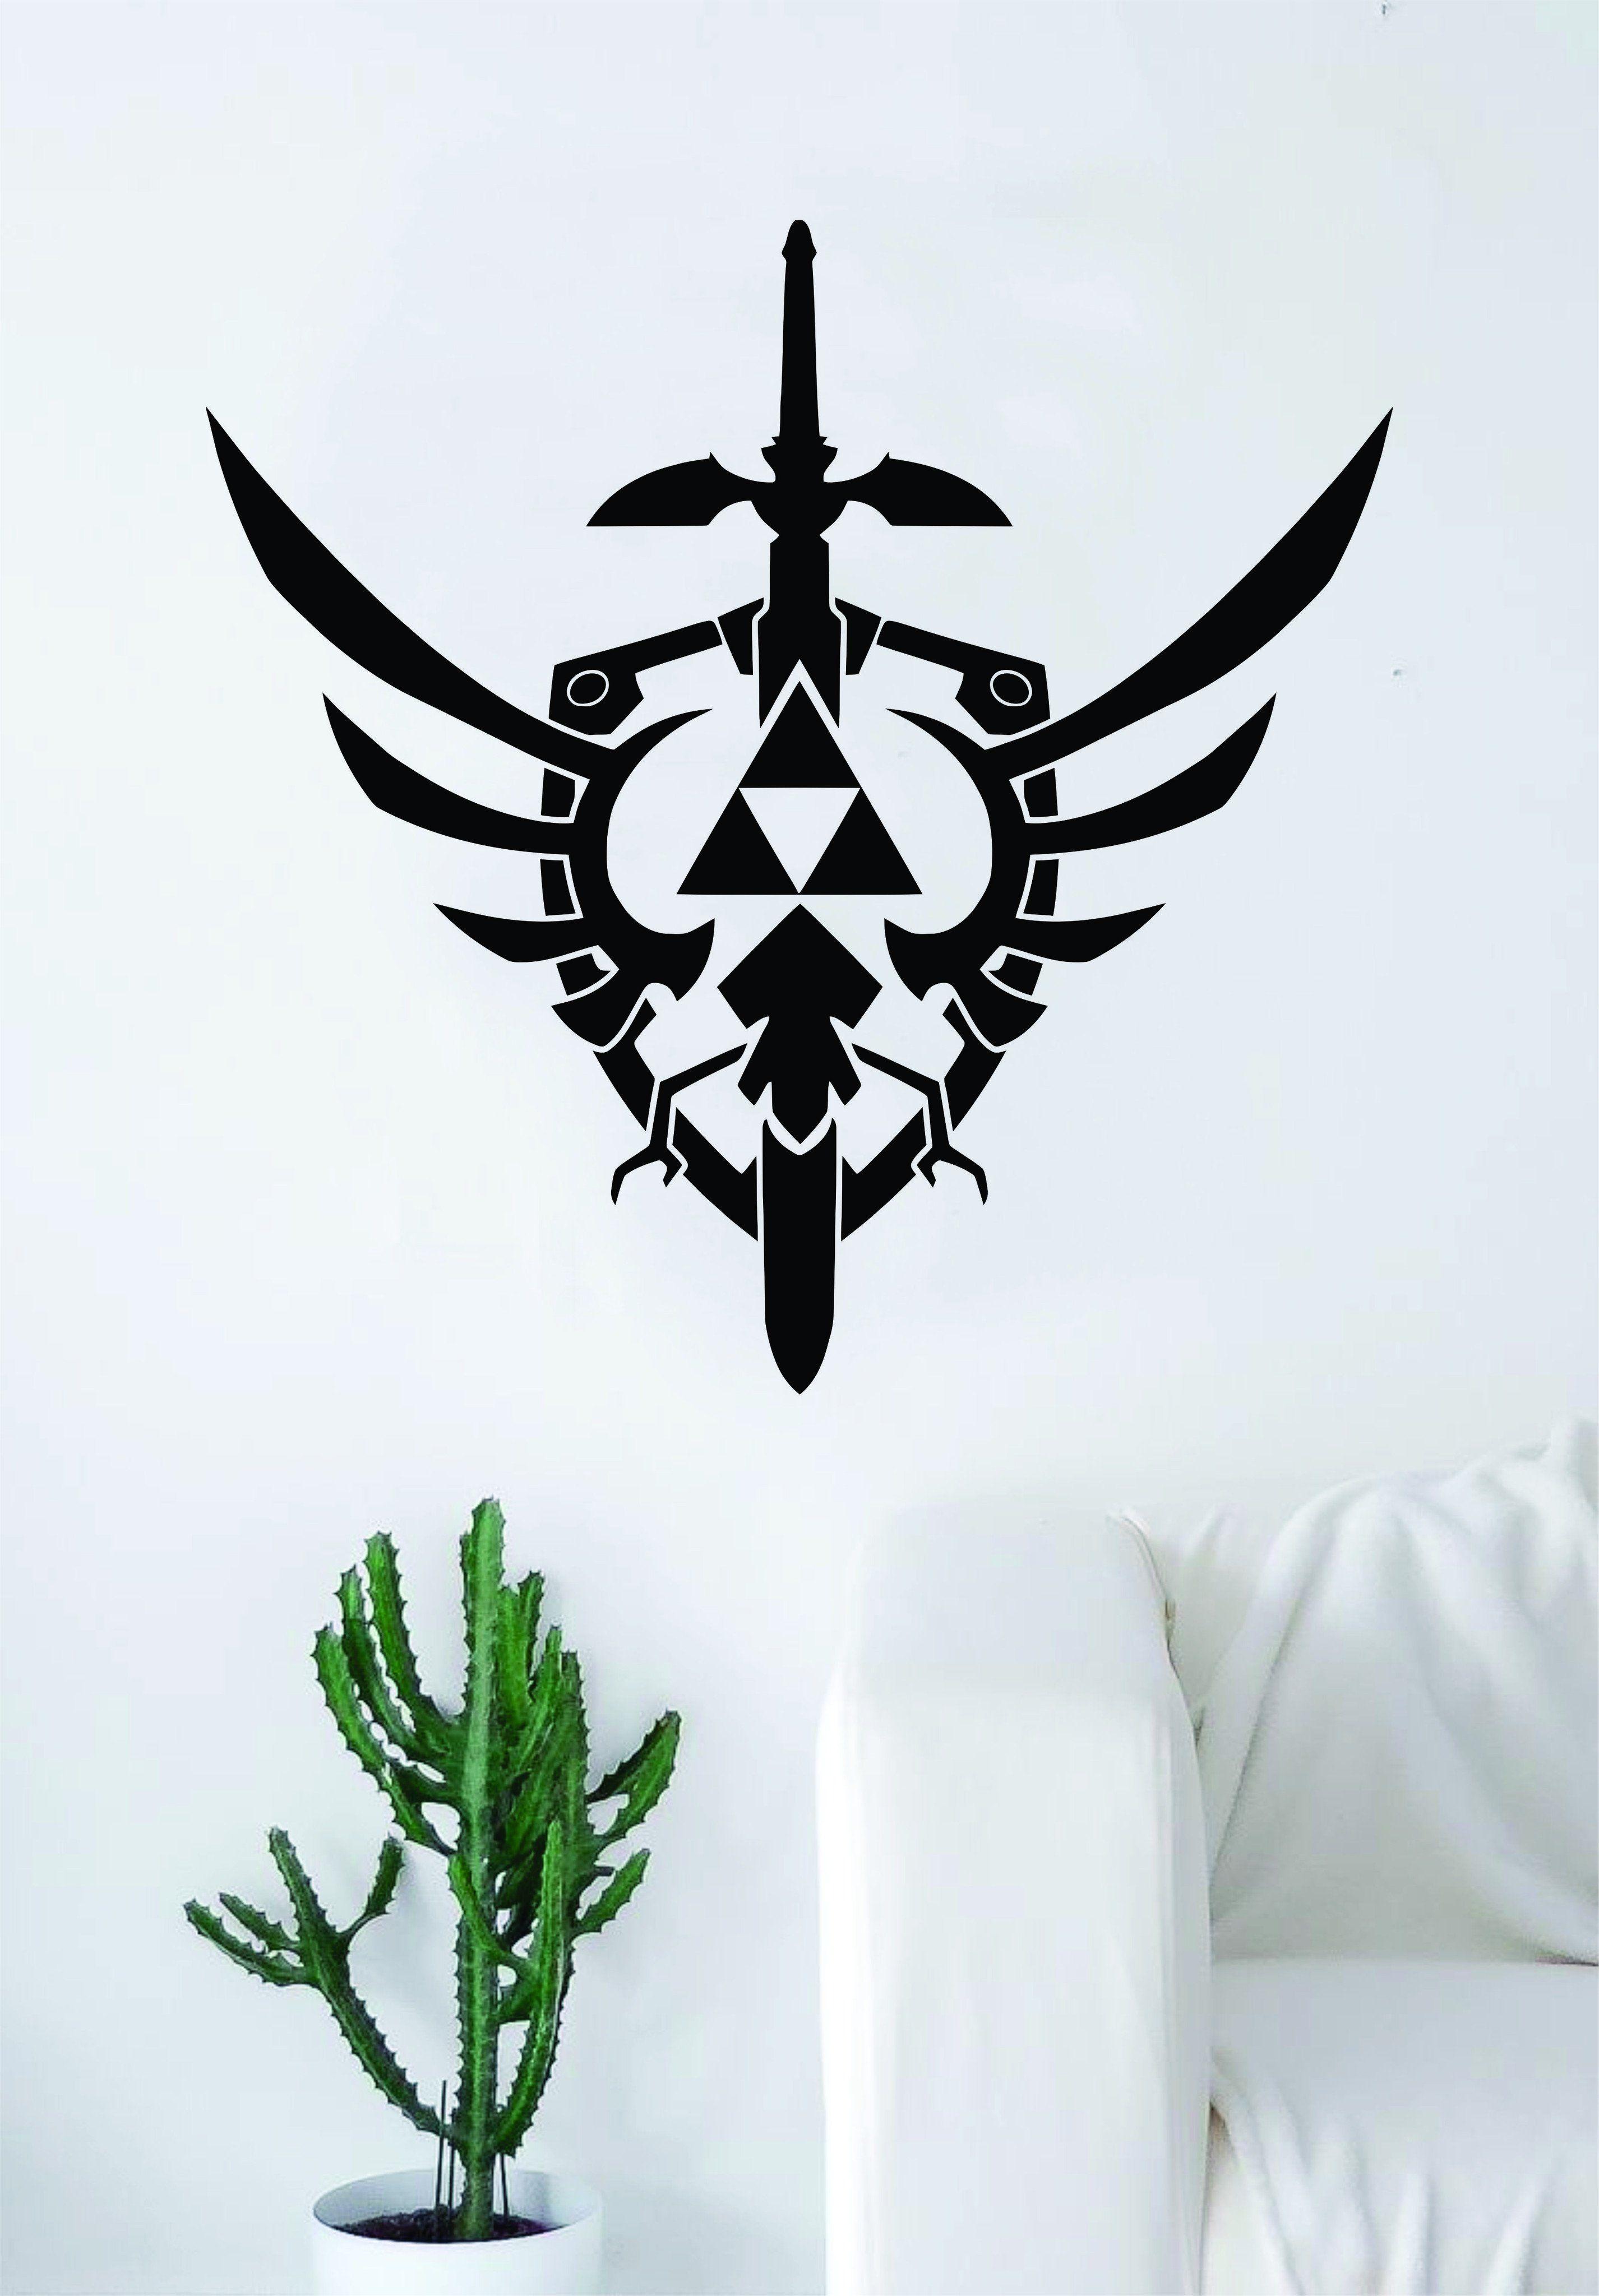 Video Games Legend Of Zelda Sword /& Shield Decal Vinyl Truck Car Sticker